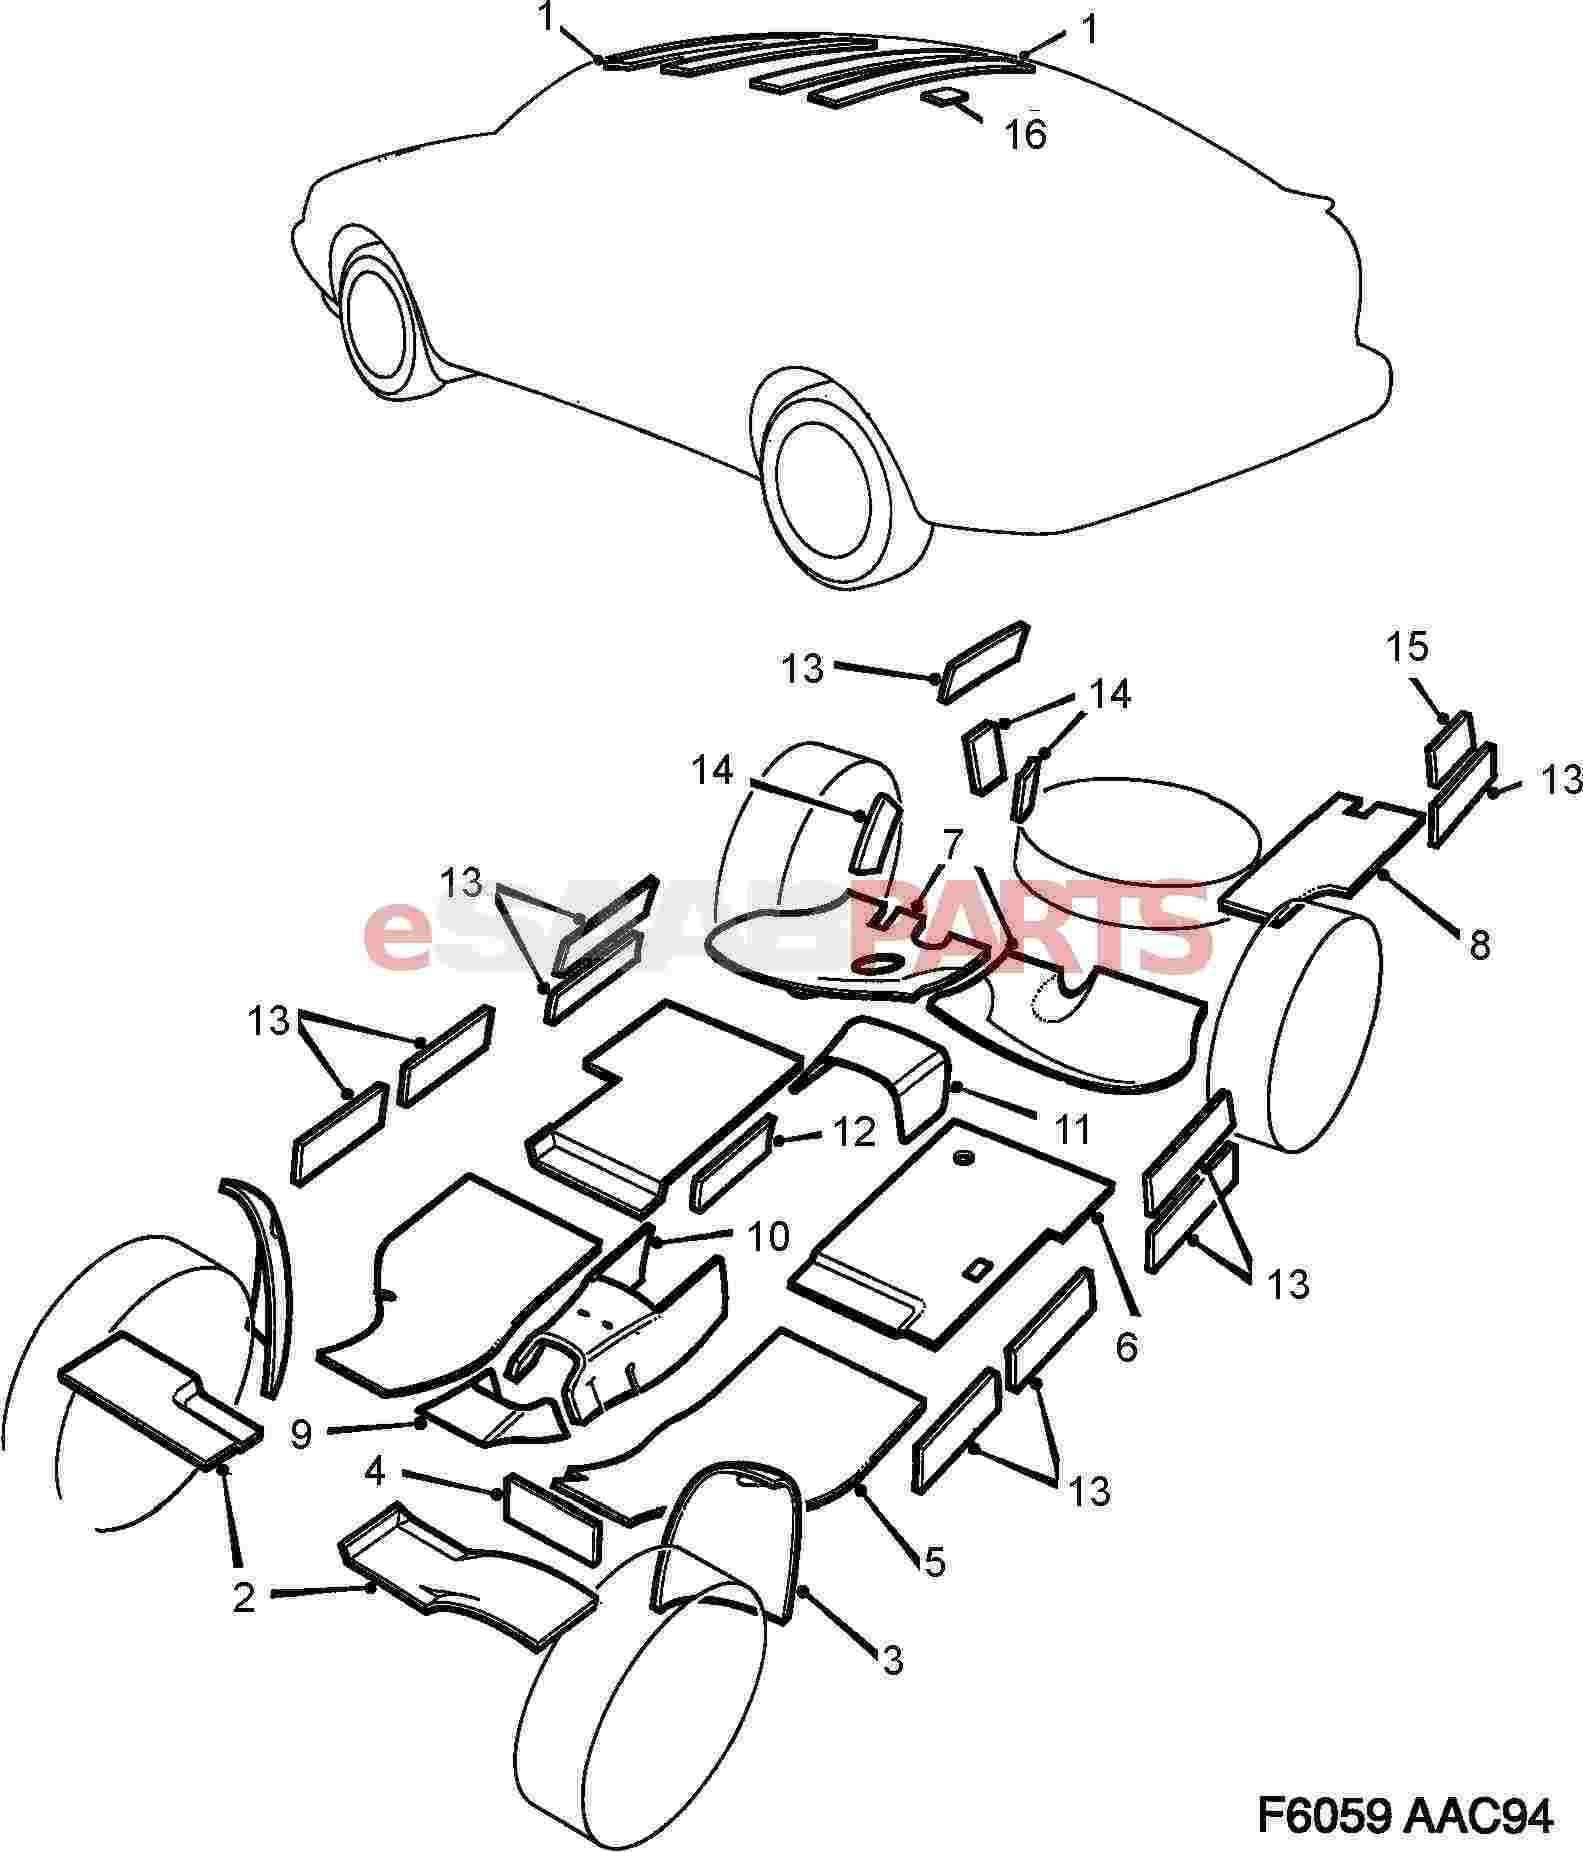 tags: #nissan armada 3rd light assembly#2005 nissan armada dash parts#nissan  body parts diagram#nissan armada starter#2005 nissan armada starter#nissan